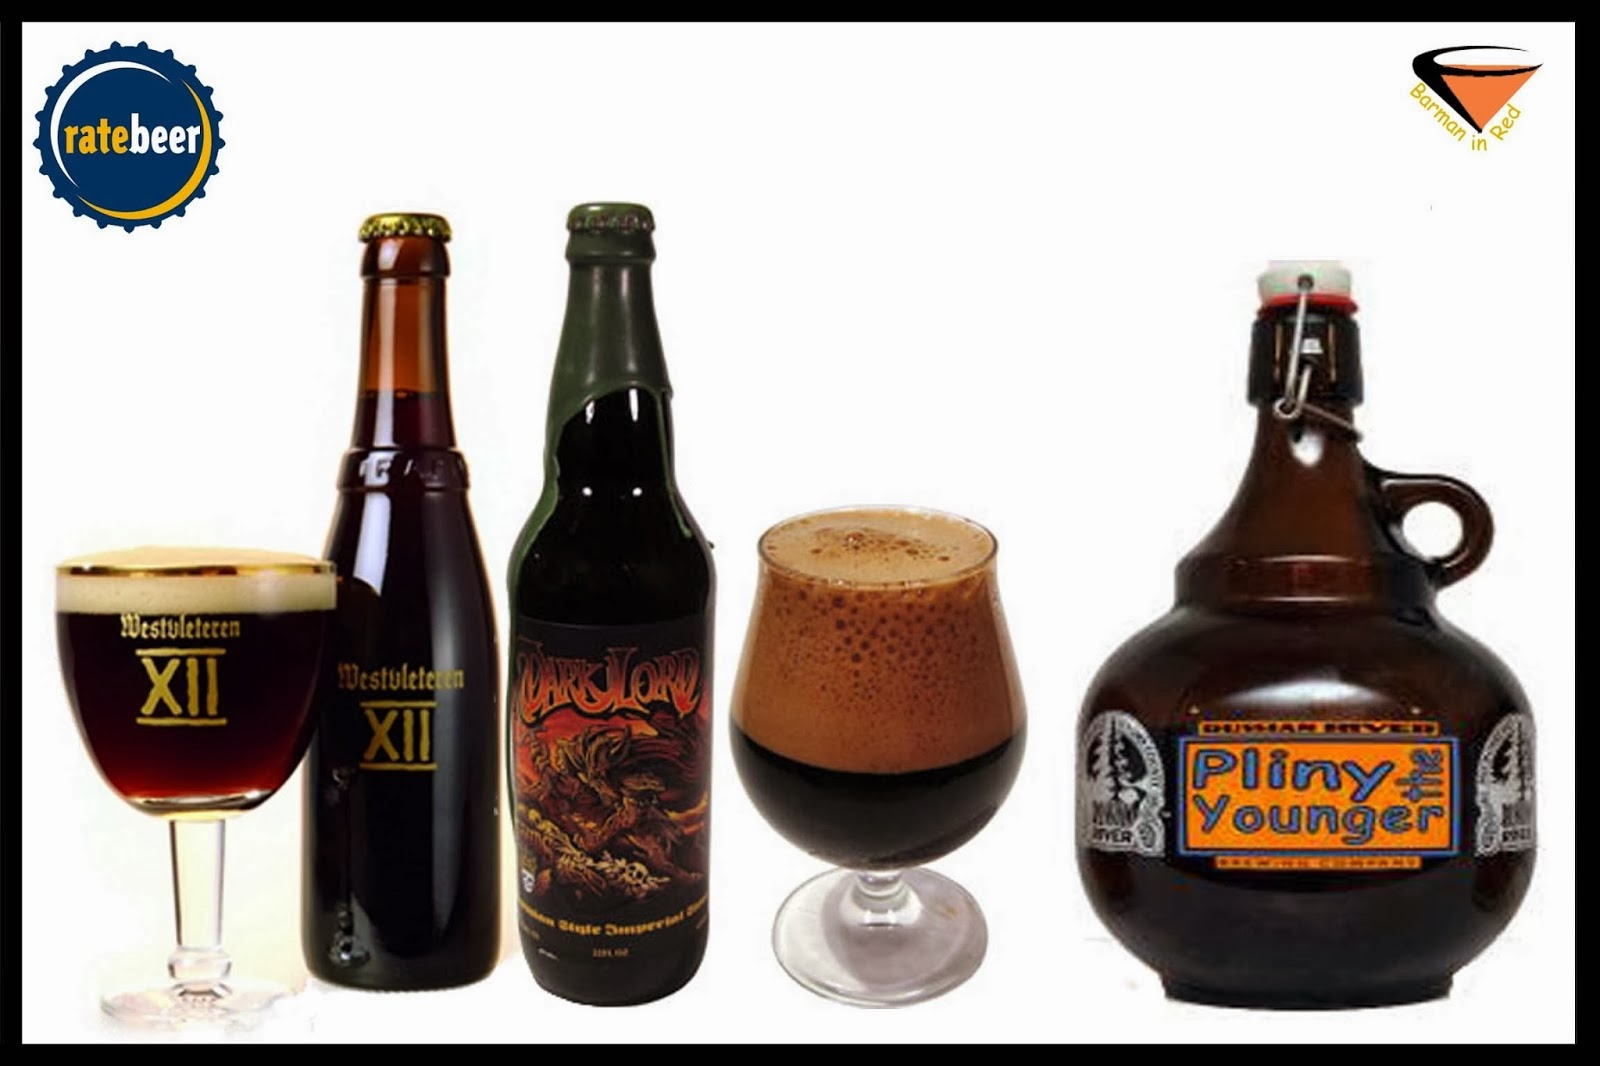 10 mejores cervezas ratebeer 2014